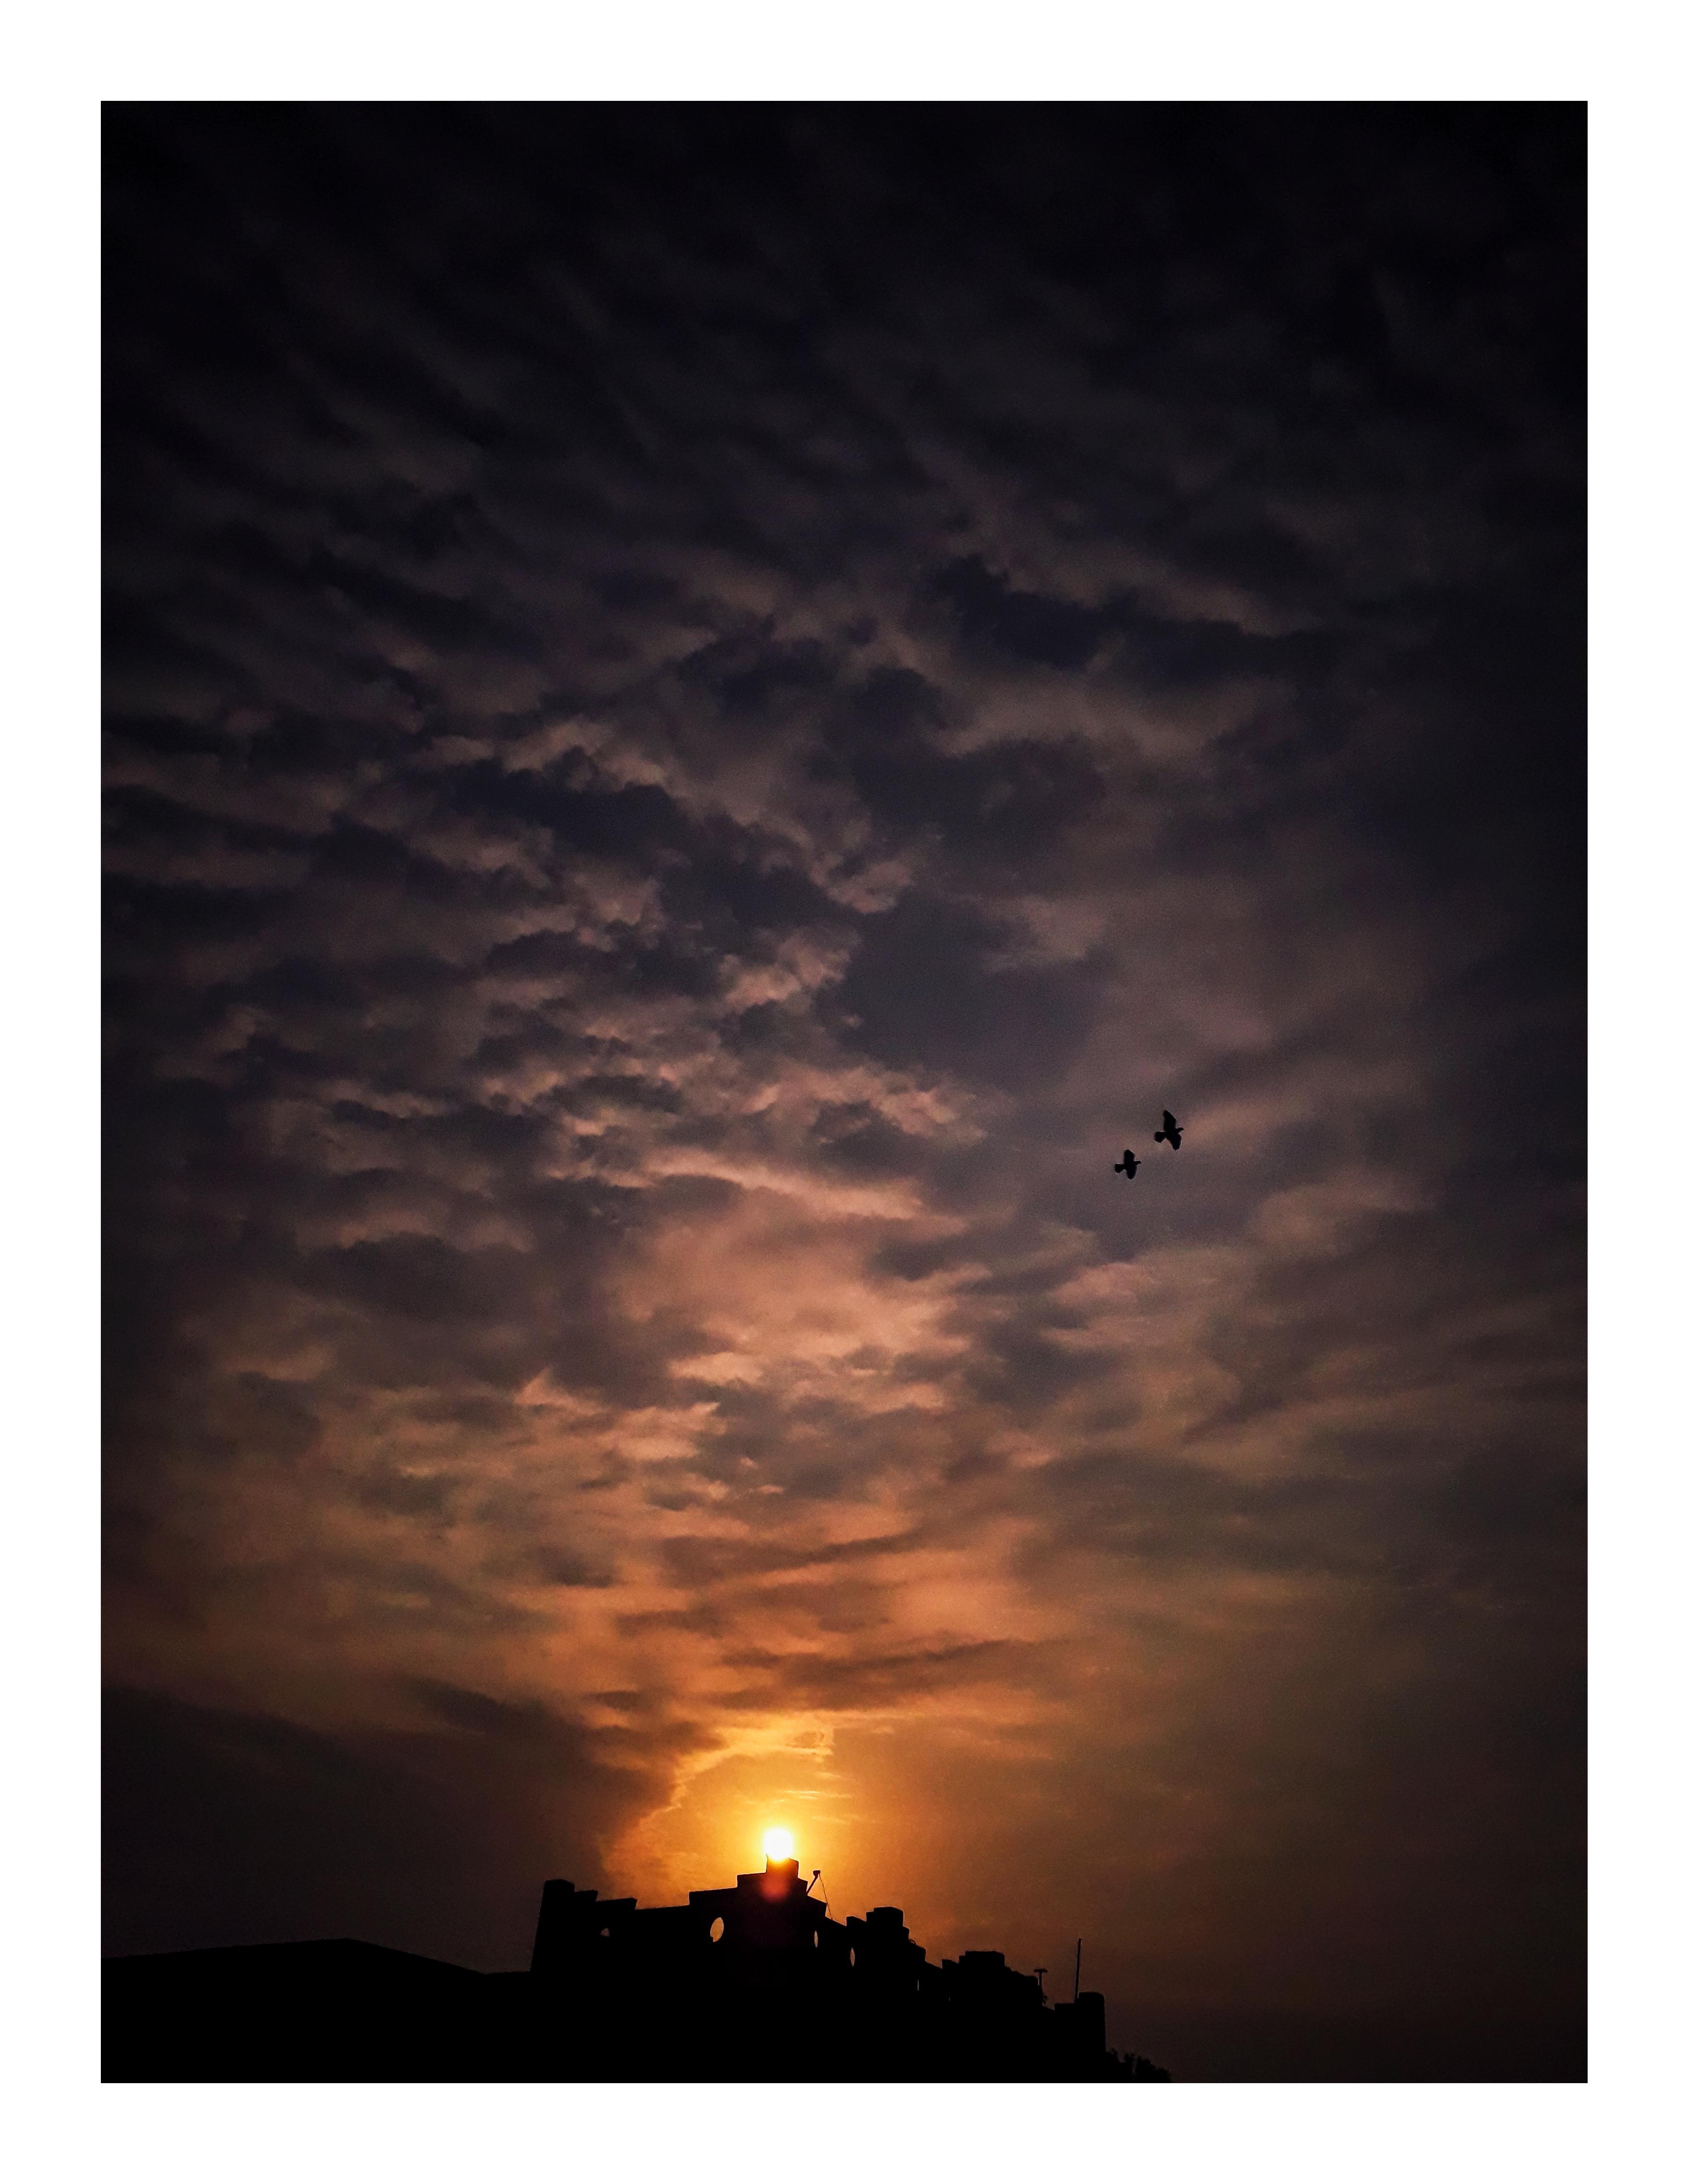 UJN... Let there be light -  Credit: ল্যাদাসুর  (Lyaadasur)   [ COPYRIGHT © 2020 SOUMYA BHATTACHARYA